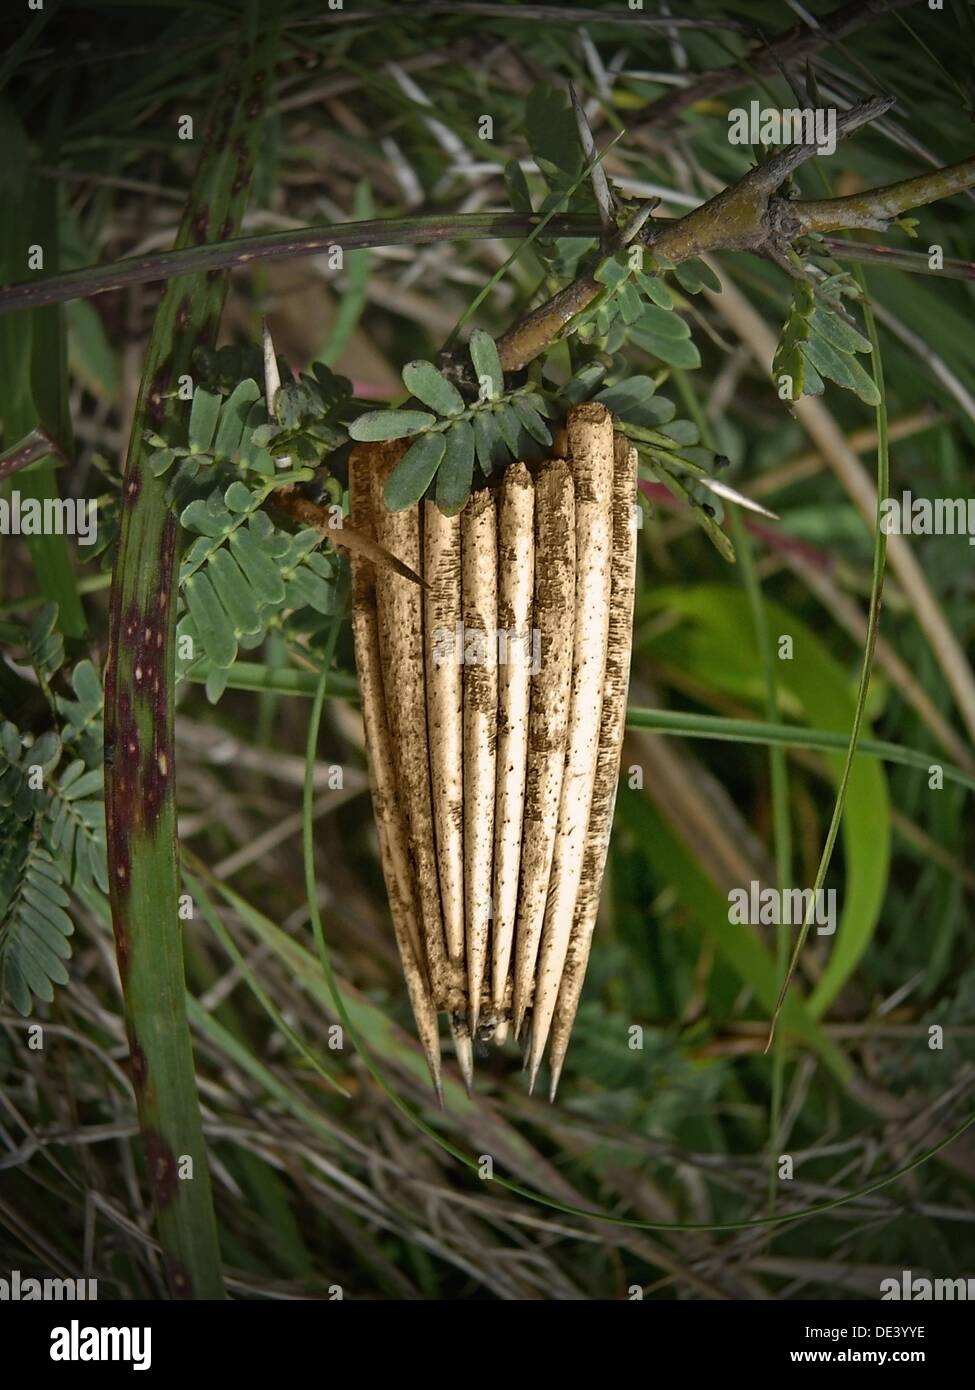 Bag worm pupa Moth Bag, Thyridopteryx ephemeraeformis - Stock Image